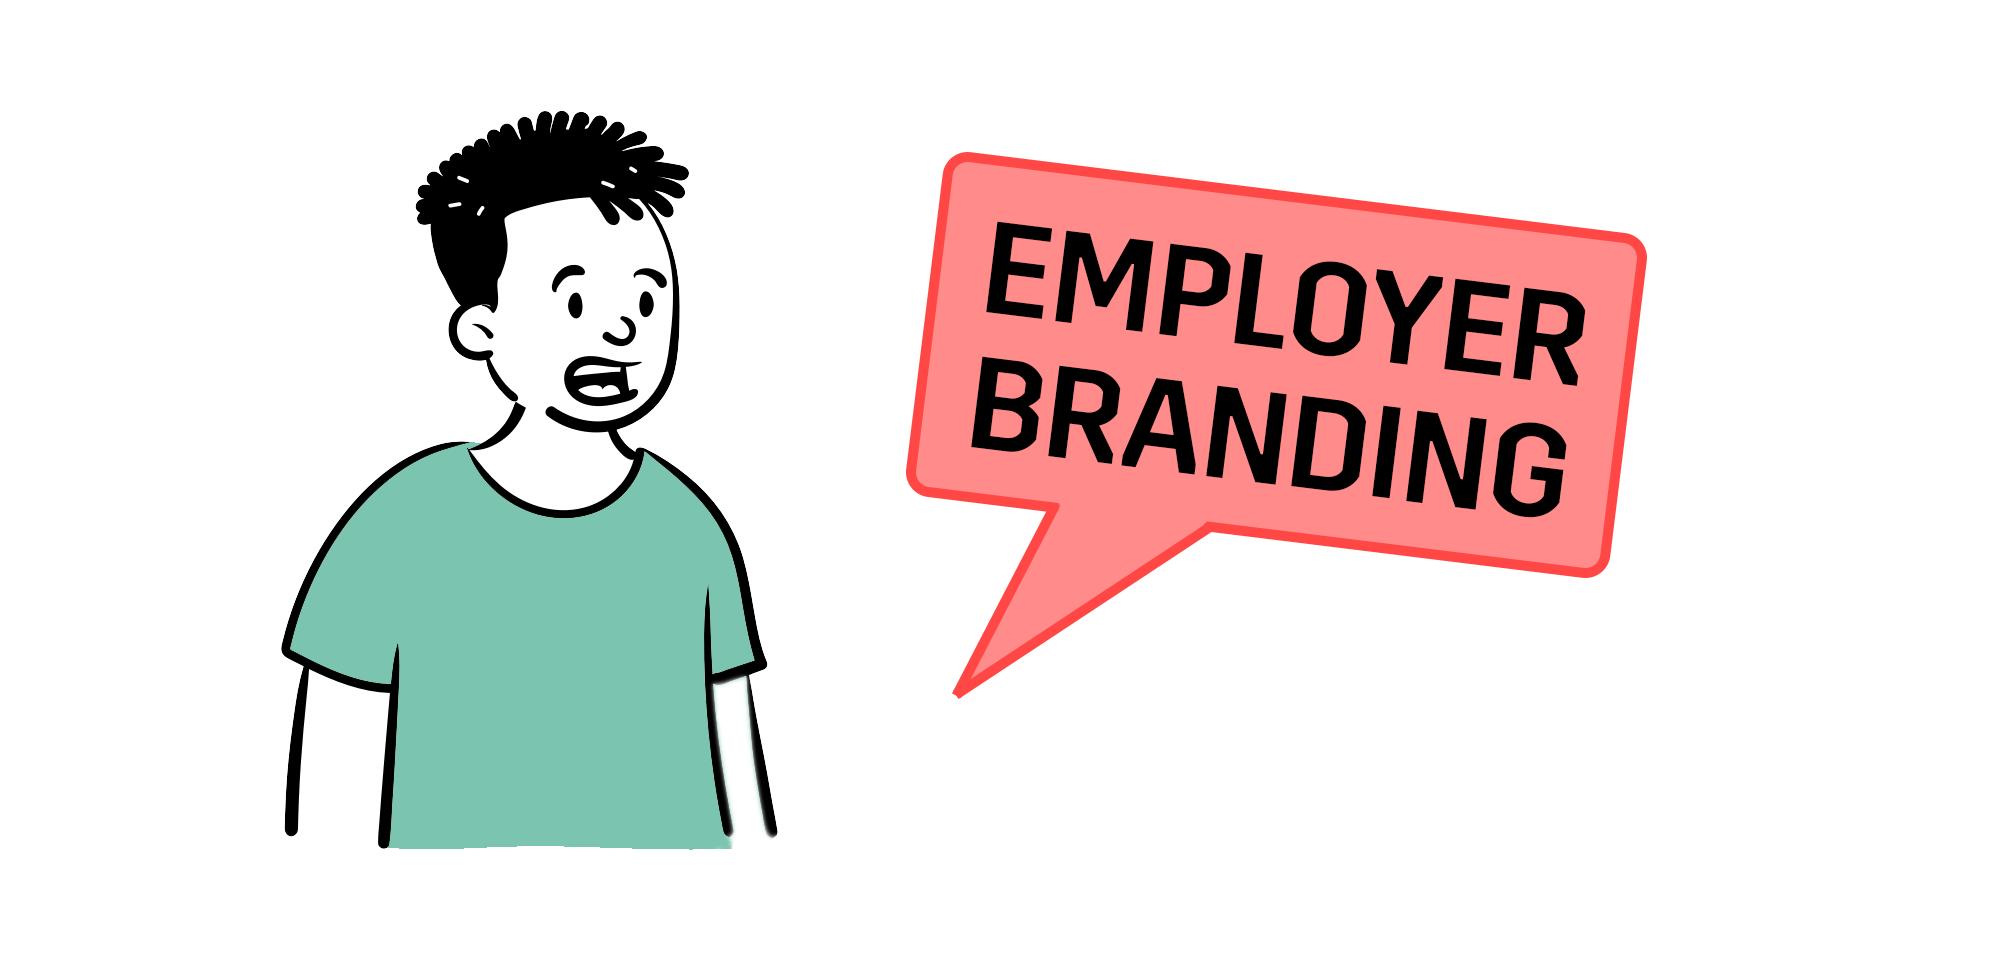 employer-brand-examples-illustration